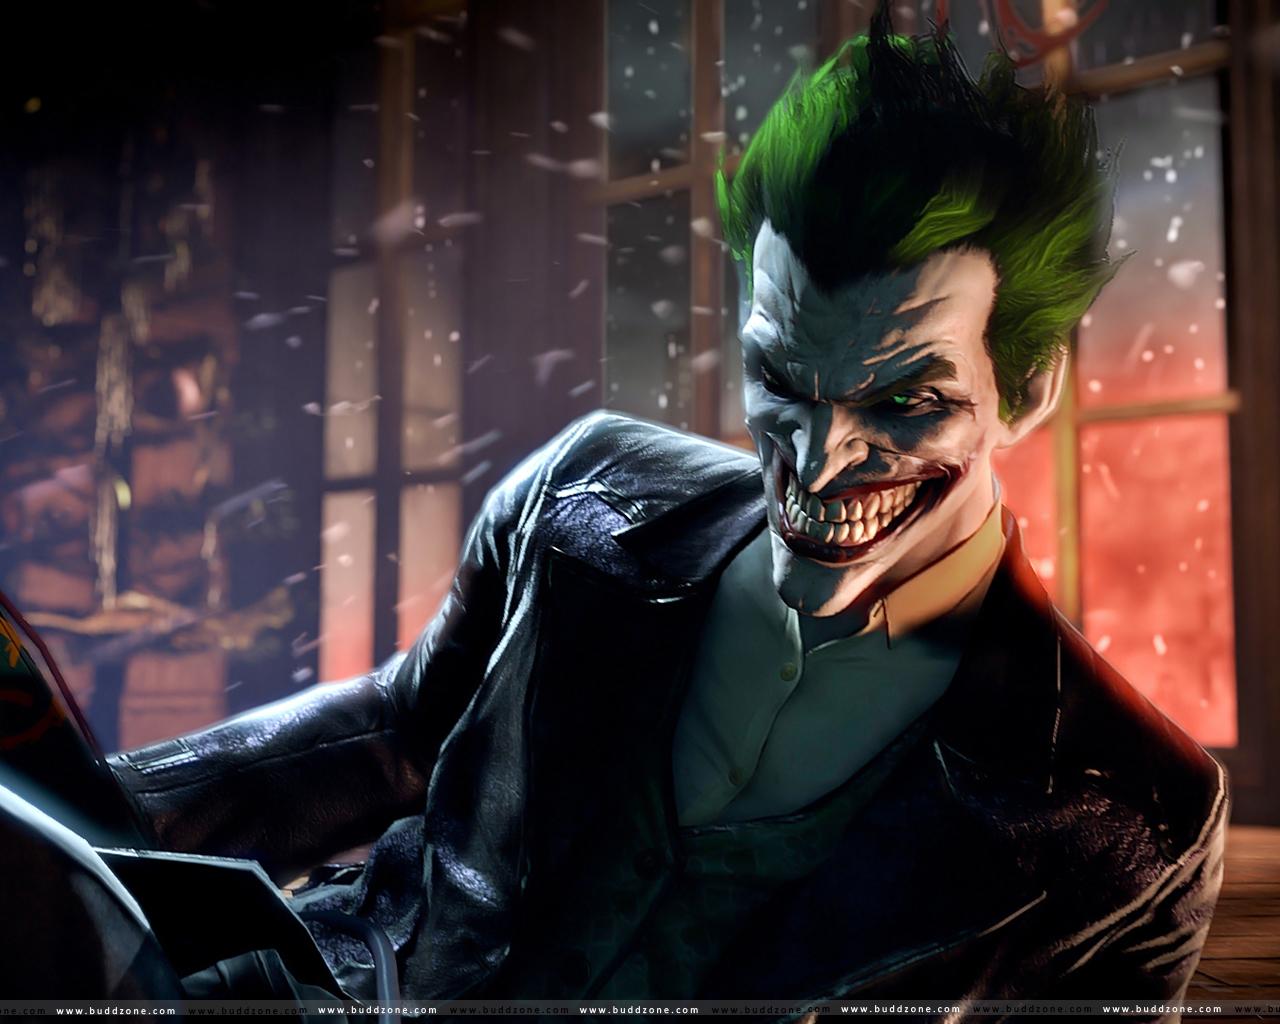 Batman Arkham Origins Wallpapers Download Wallpapers 1280x1024